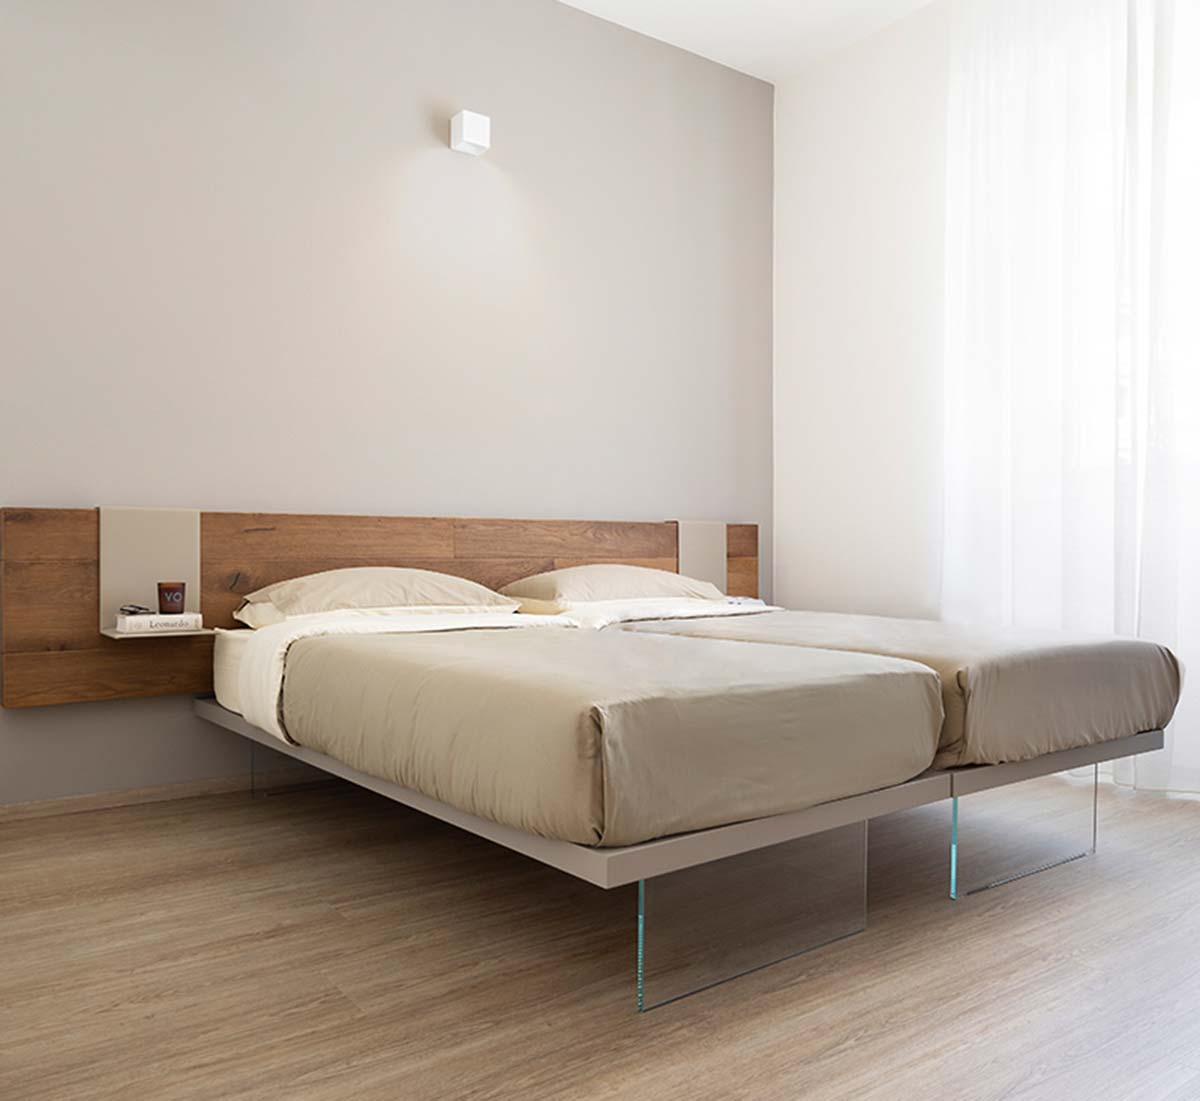 Collezione Air, LAGO Welcome Baveno @The View Lifestyle Apartments